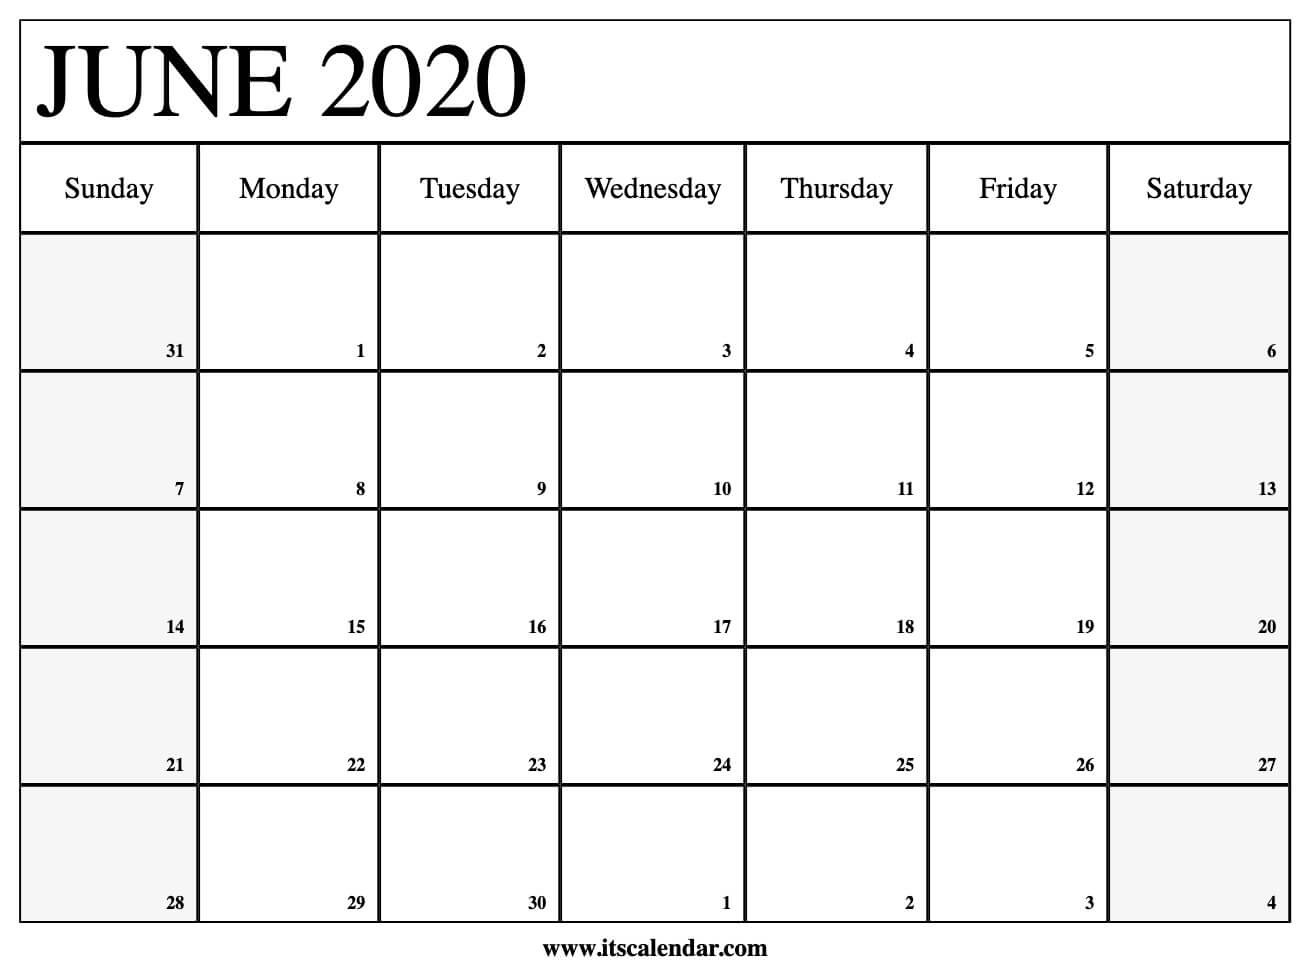 Free Printable June 2020 Calendar  Printable Methodist Calendar For 2020